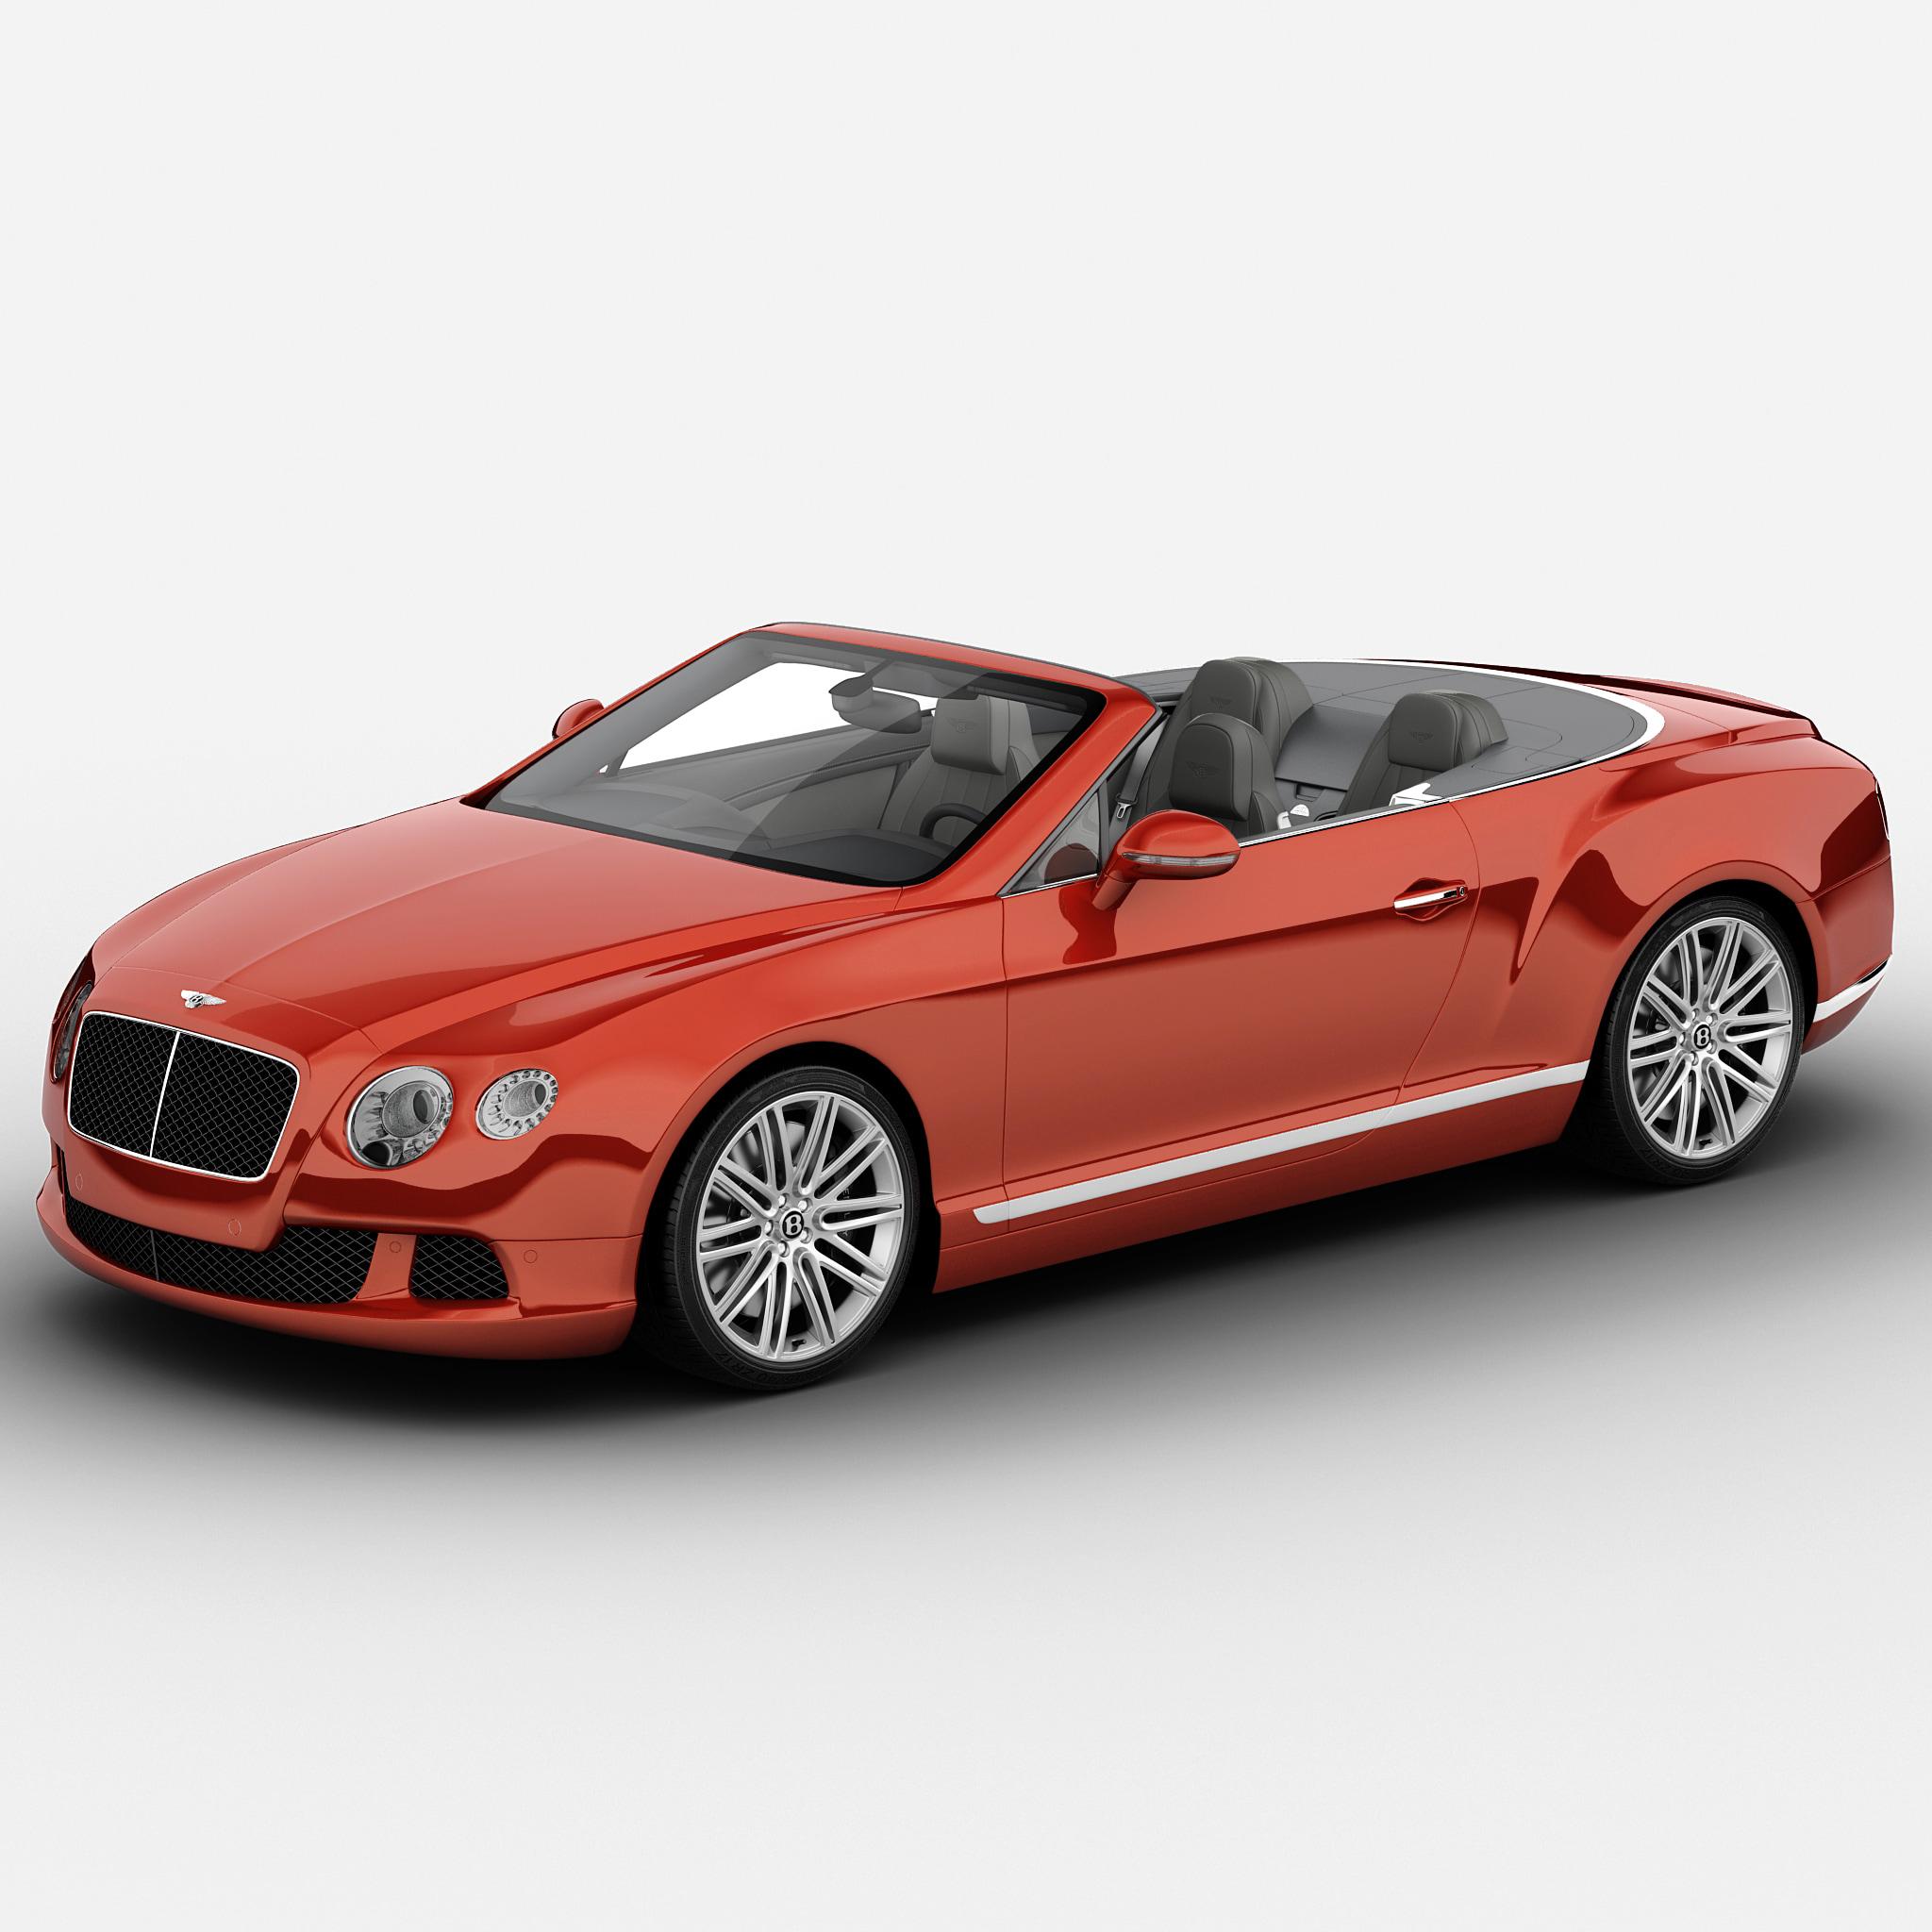 Bentley Continental GT 2014 Convertible_2.jpg